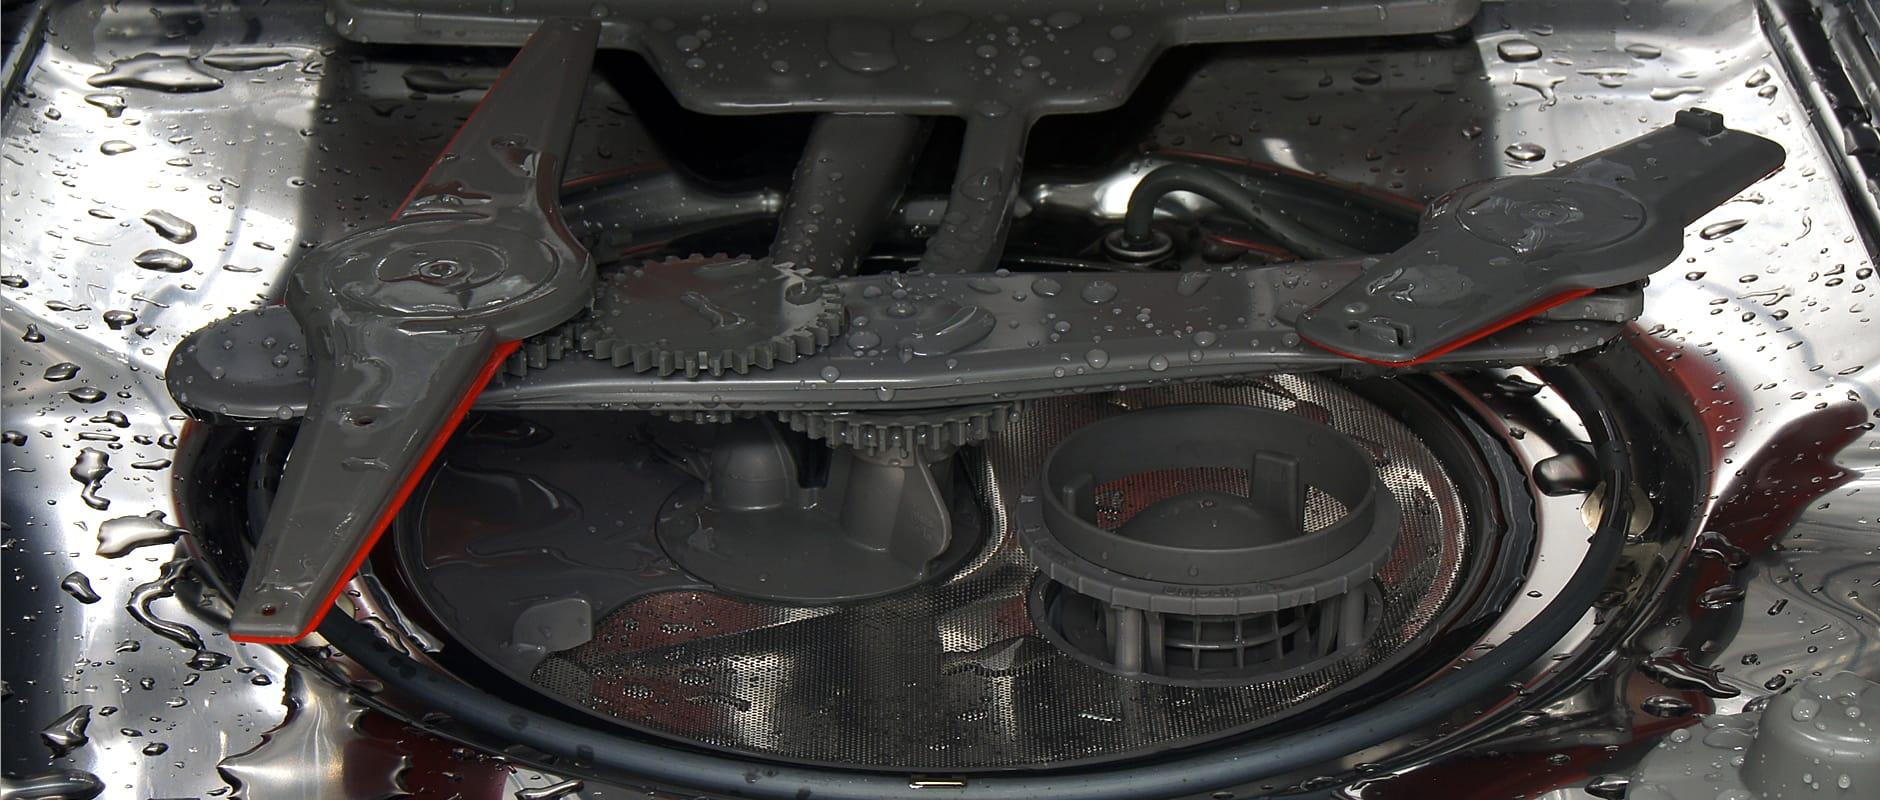 Kenmore Elite 12773 Dishwasher Review Reviewed Com